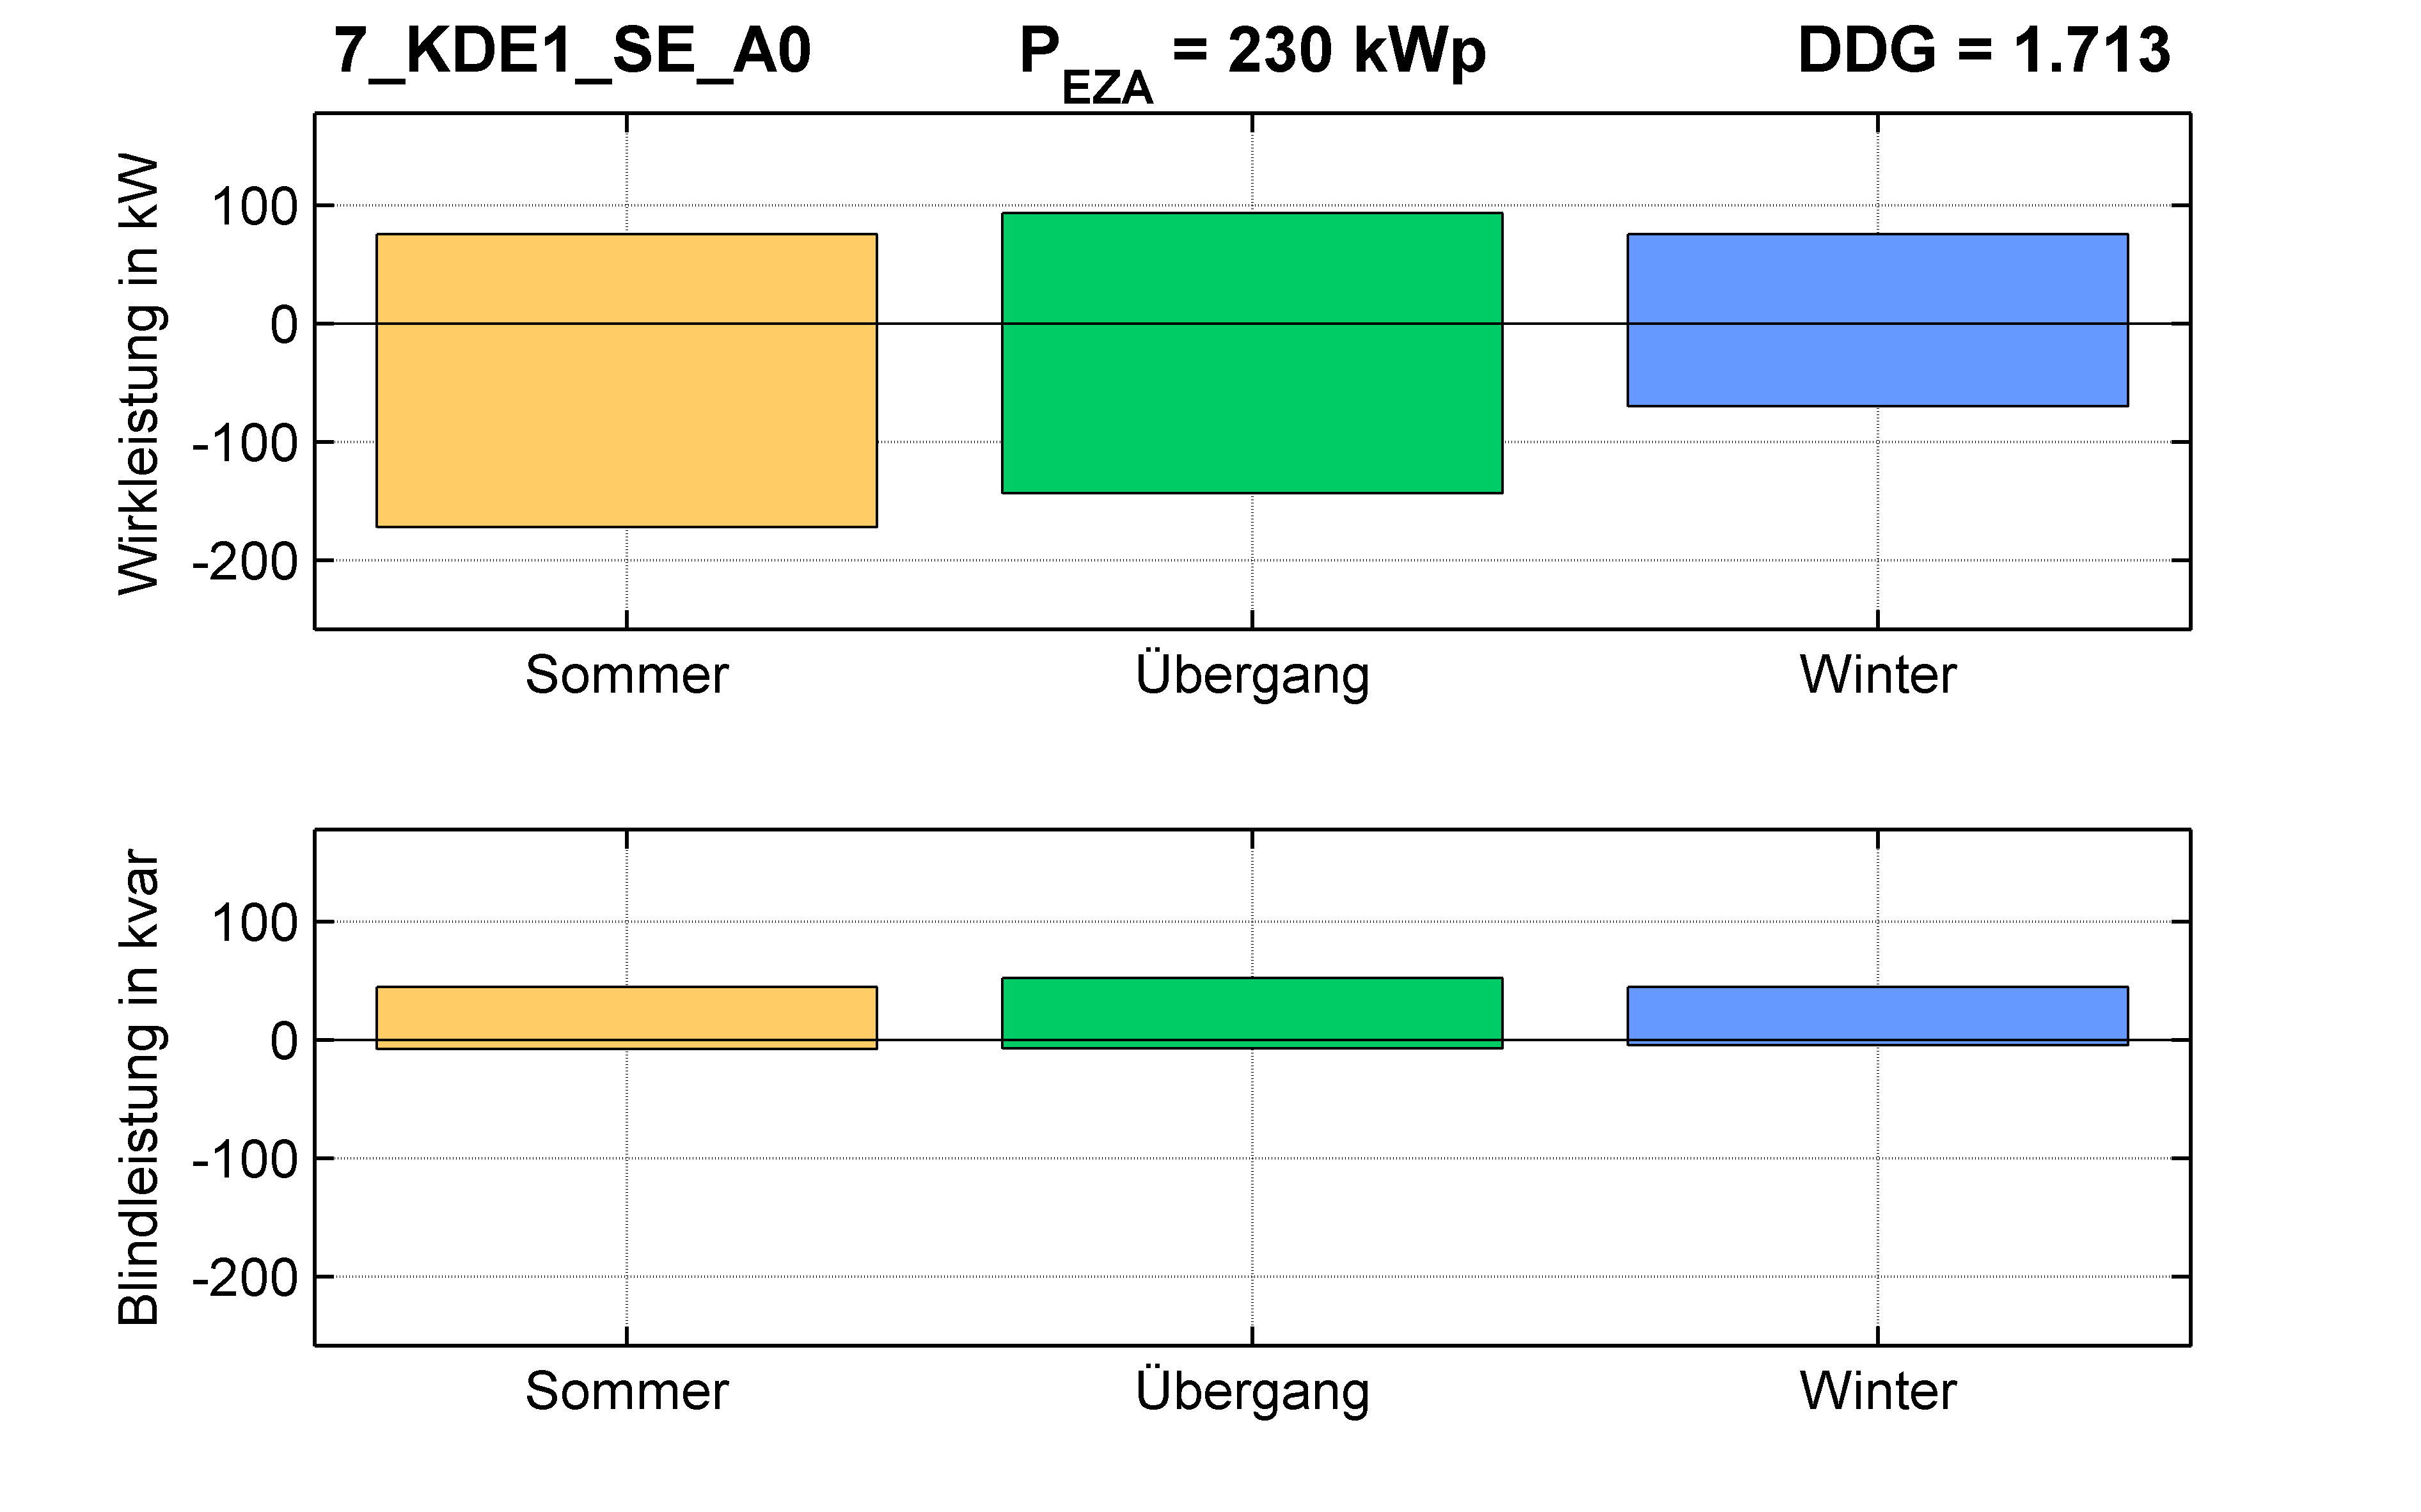 KDE1 | Längsregler (SE) A0 | PQ-Bilanz